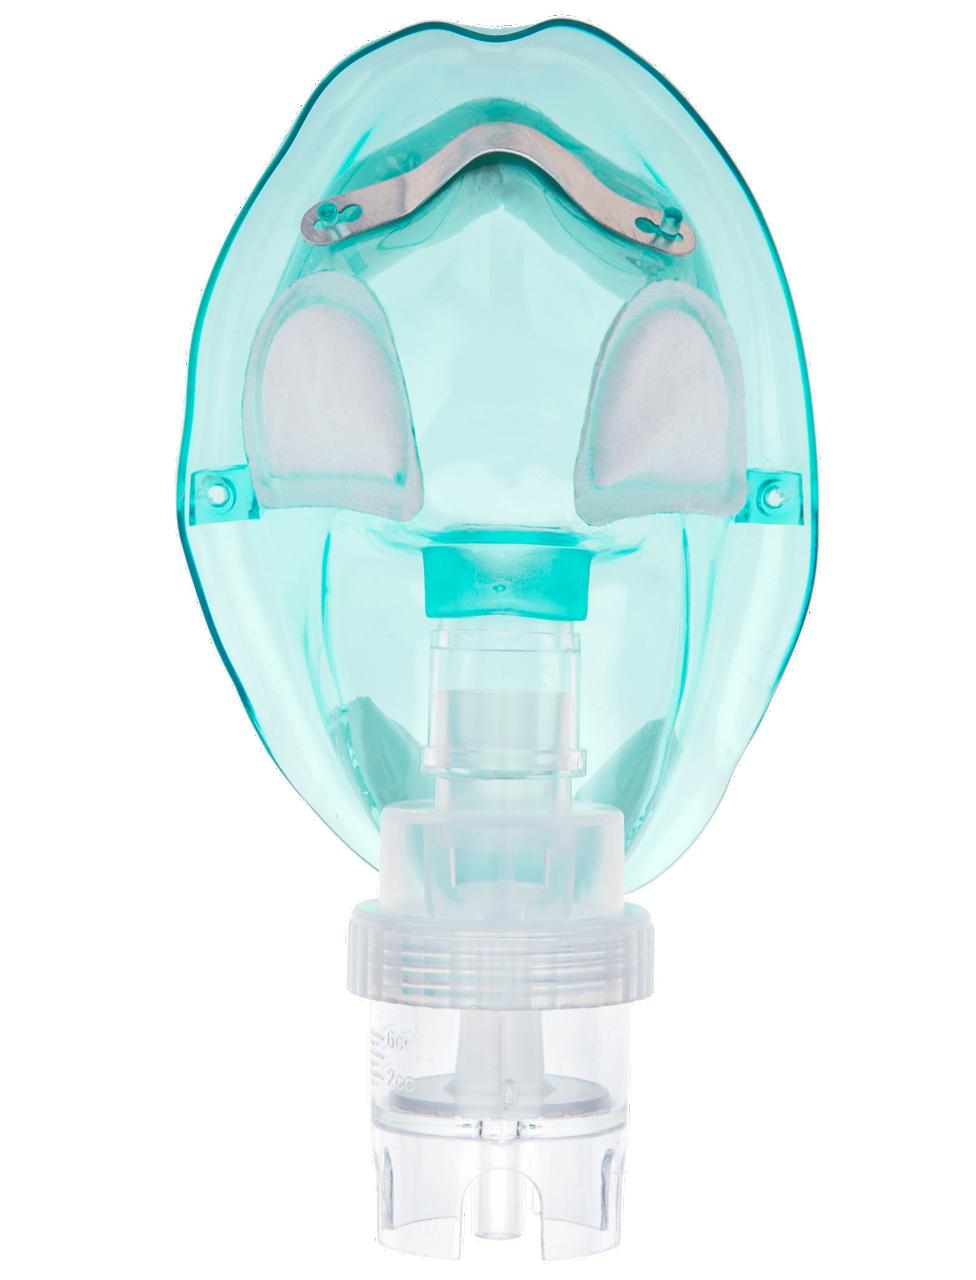 SafetyNeb Filtered Nebulizing Mask w/ Tubing - Each